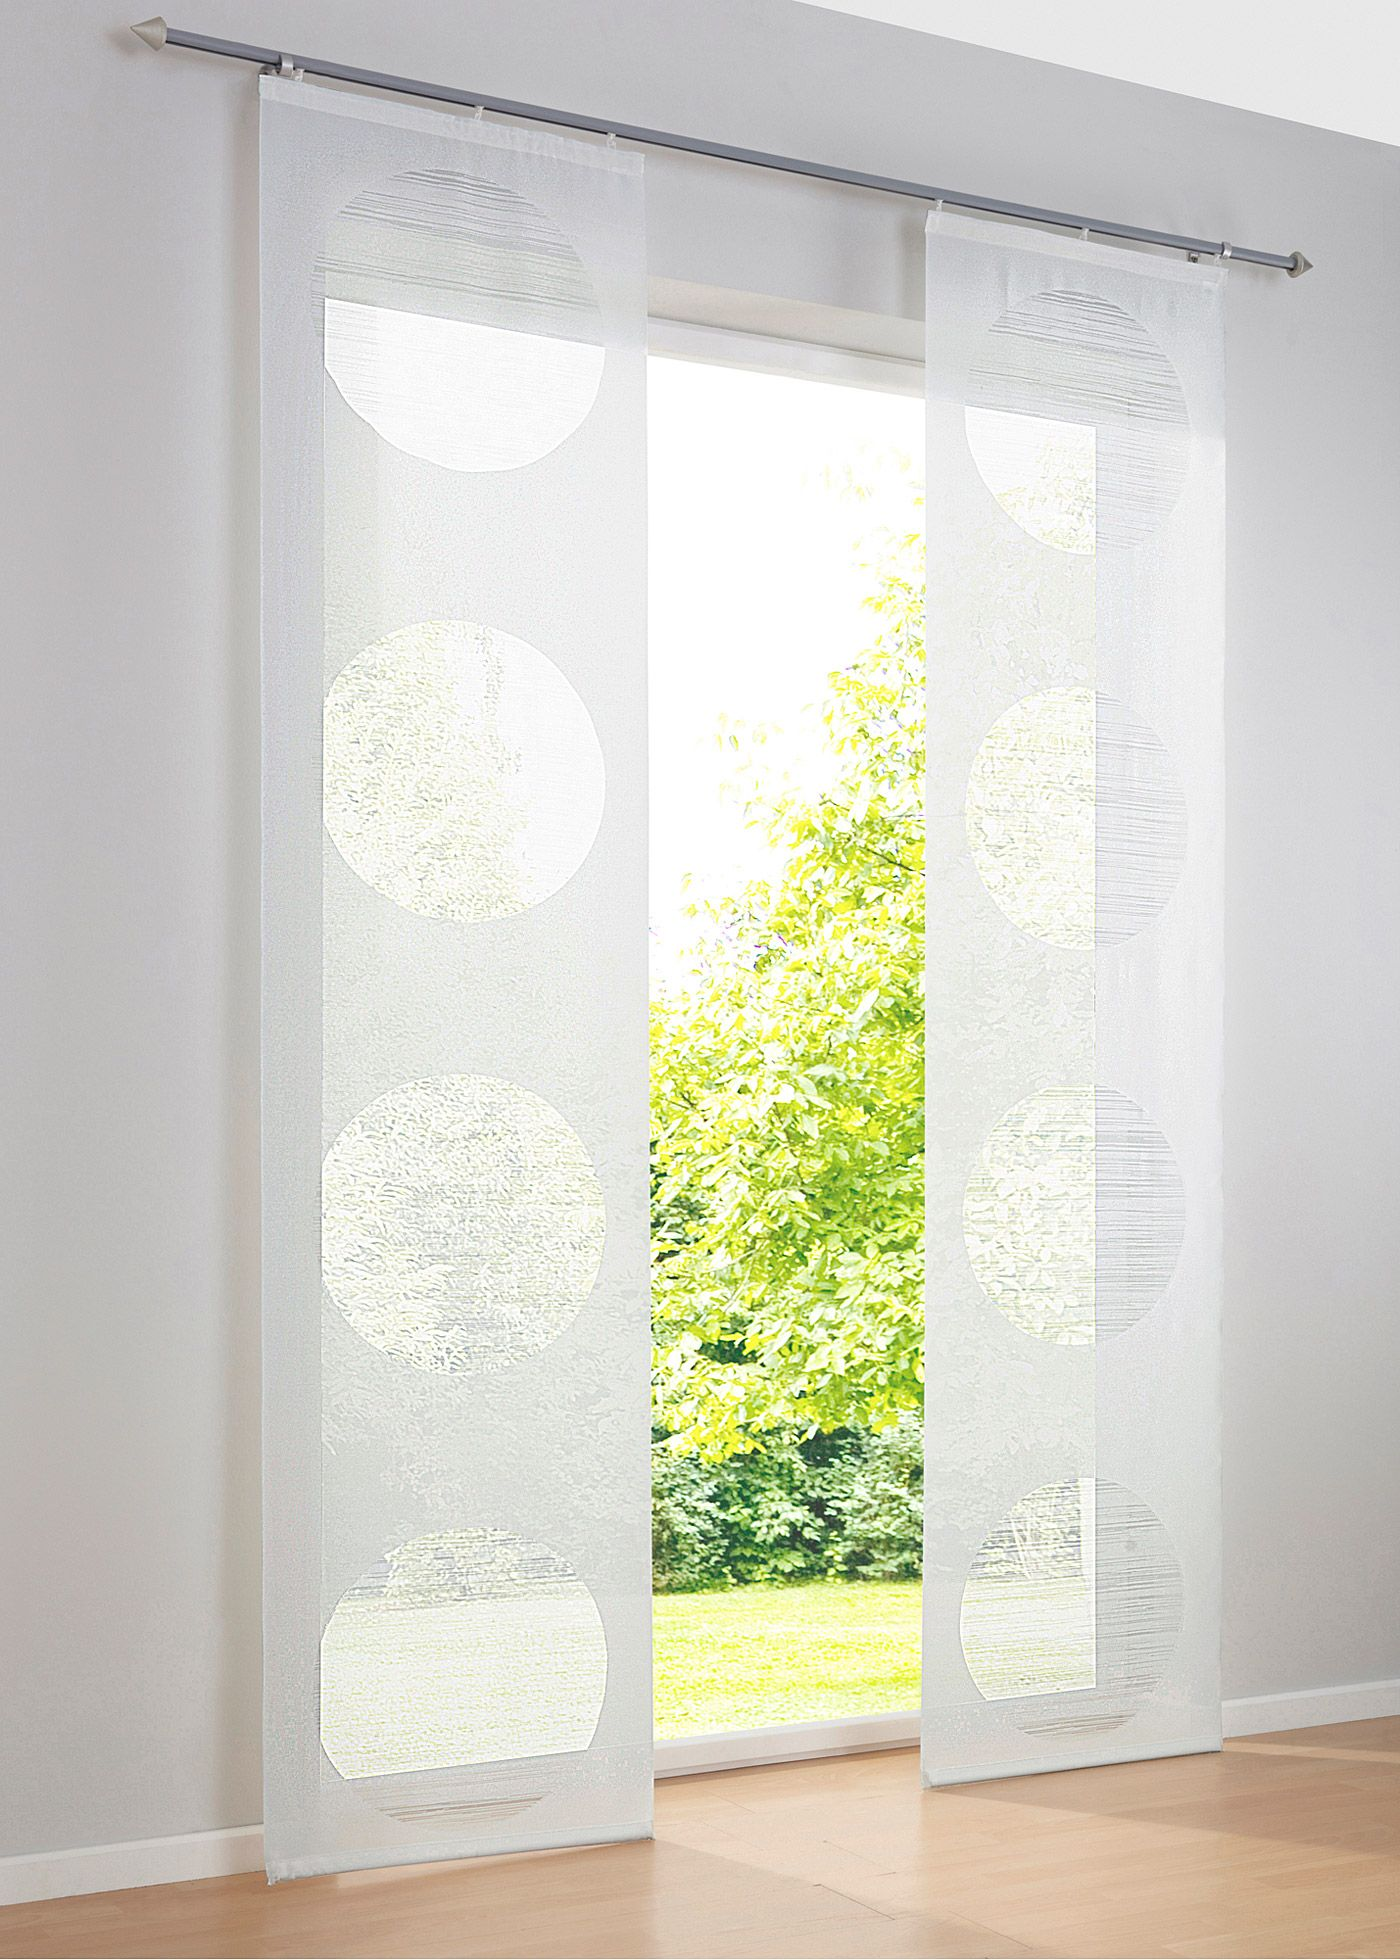 Frisch Bonprix Gardinen Wohnzimmer Ideen